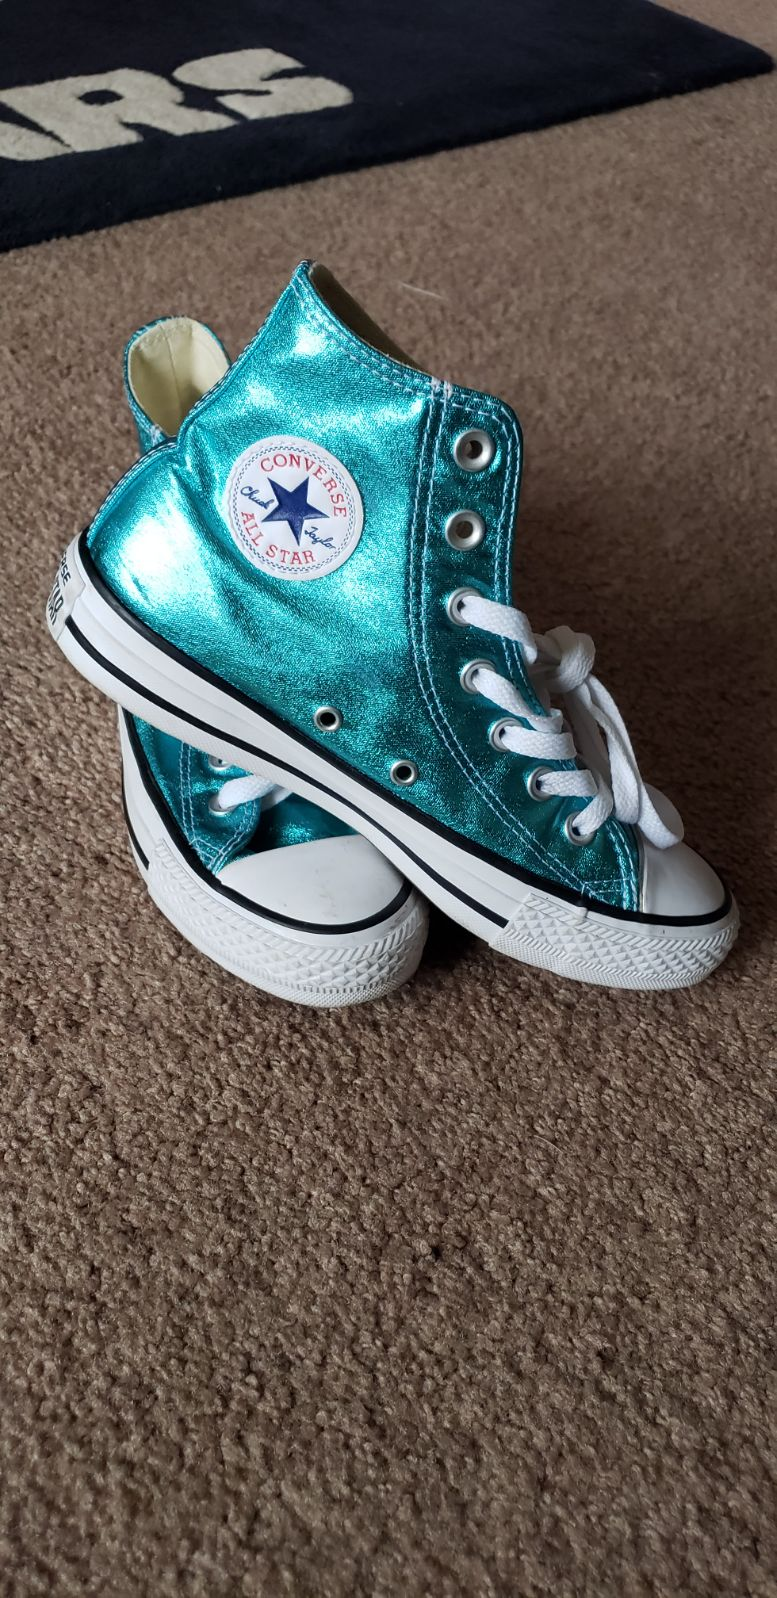 Converse shoes Metallic size 6 women's